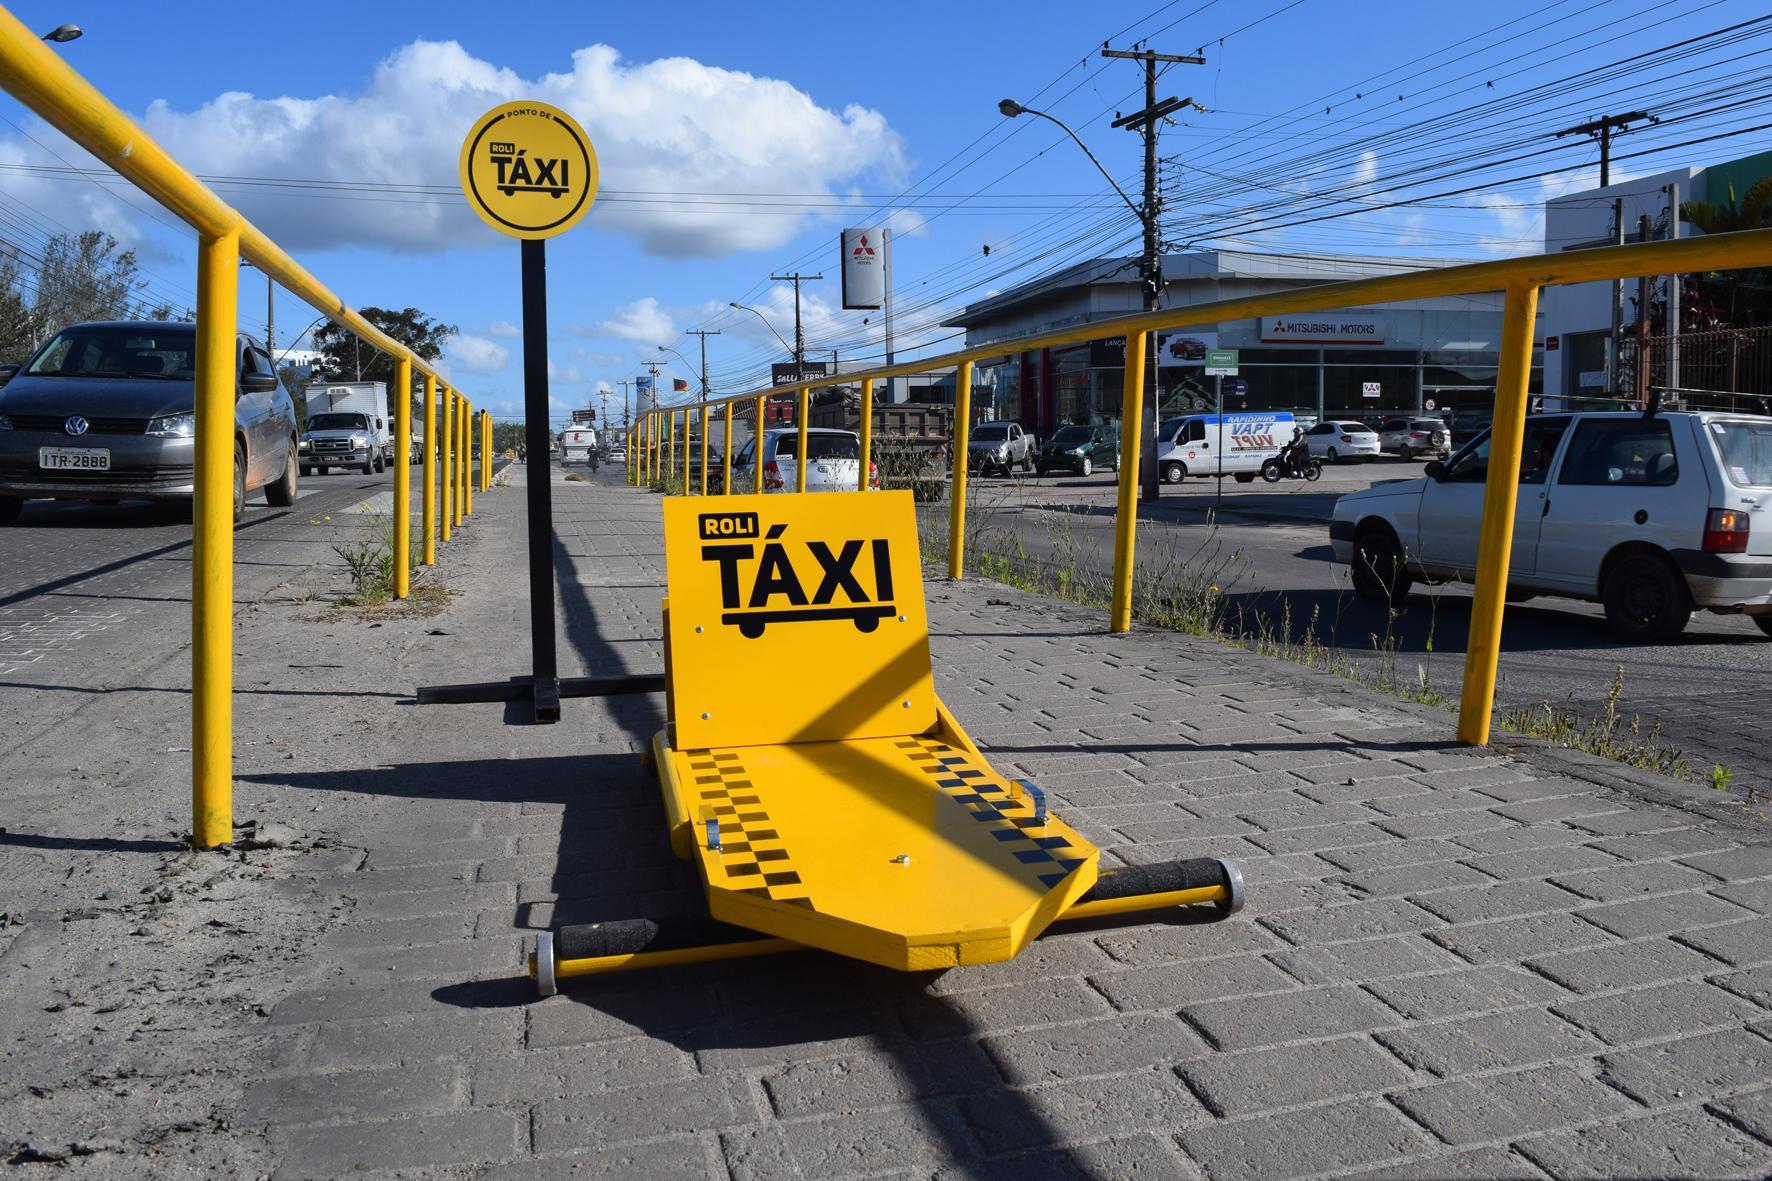 Biscoitos Zezé Ambient Ad - Roli taxi